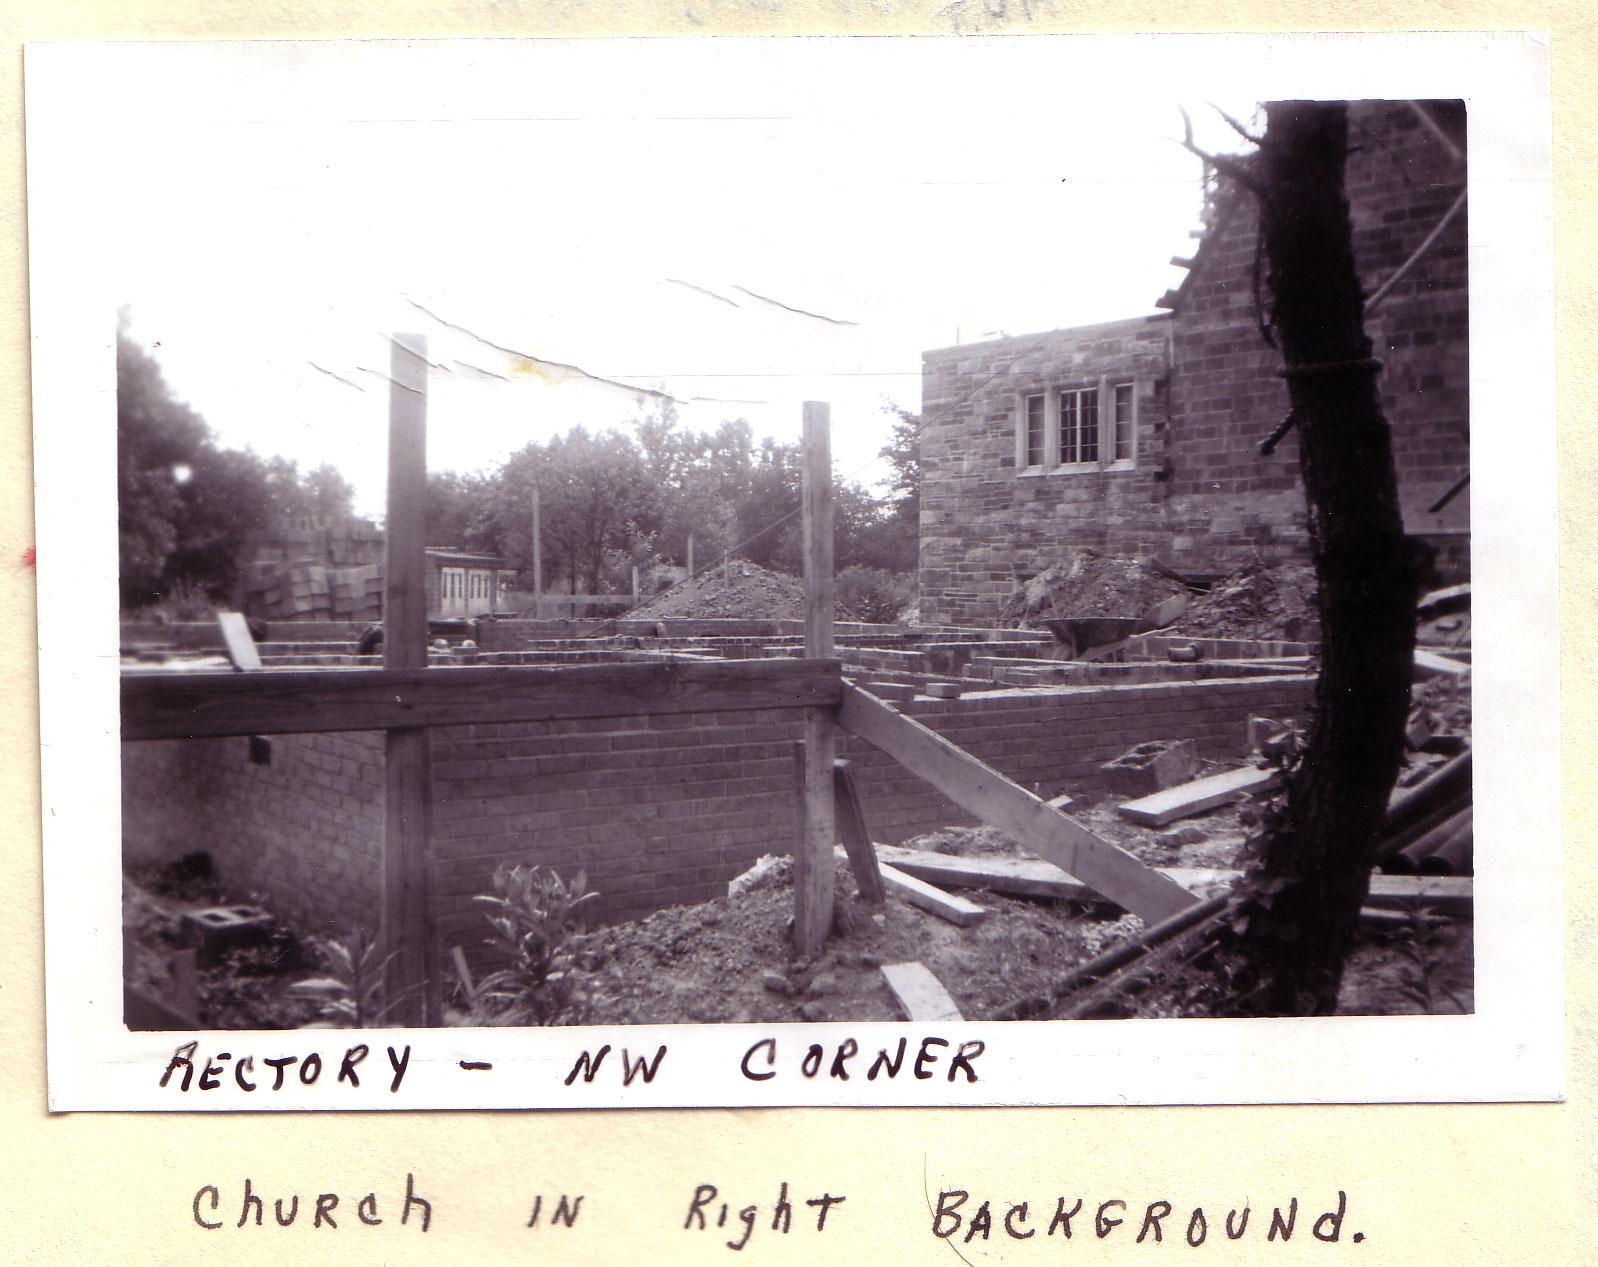 24 Aug 1949